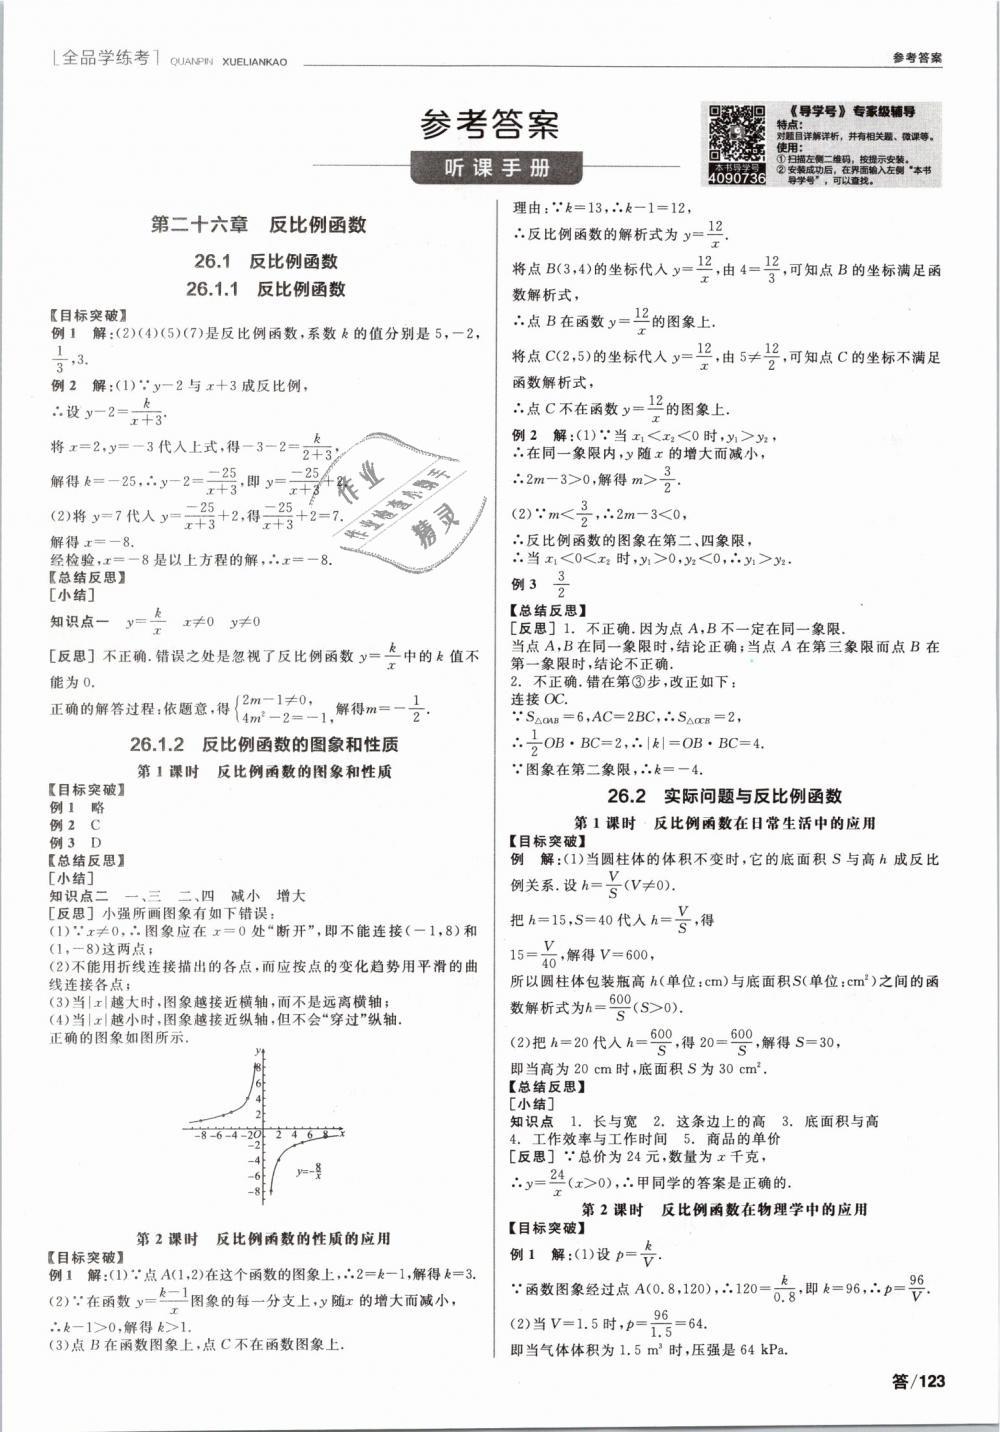 ���ʿ���ר���ƺš��ٷ���ַ22270.COM_2019年全品学练考九年级数学下册人教版第1页